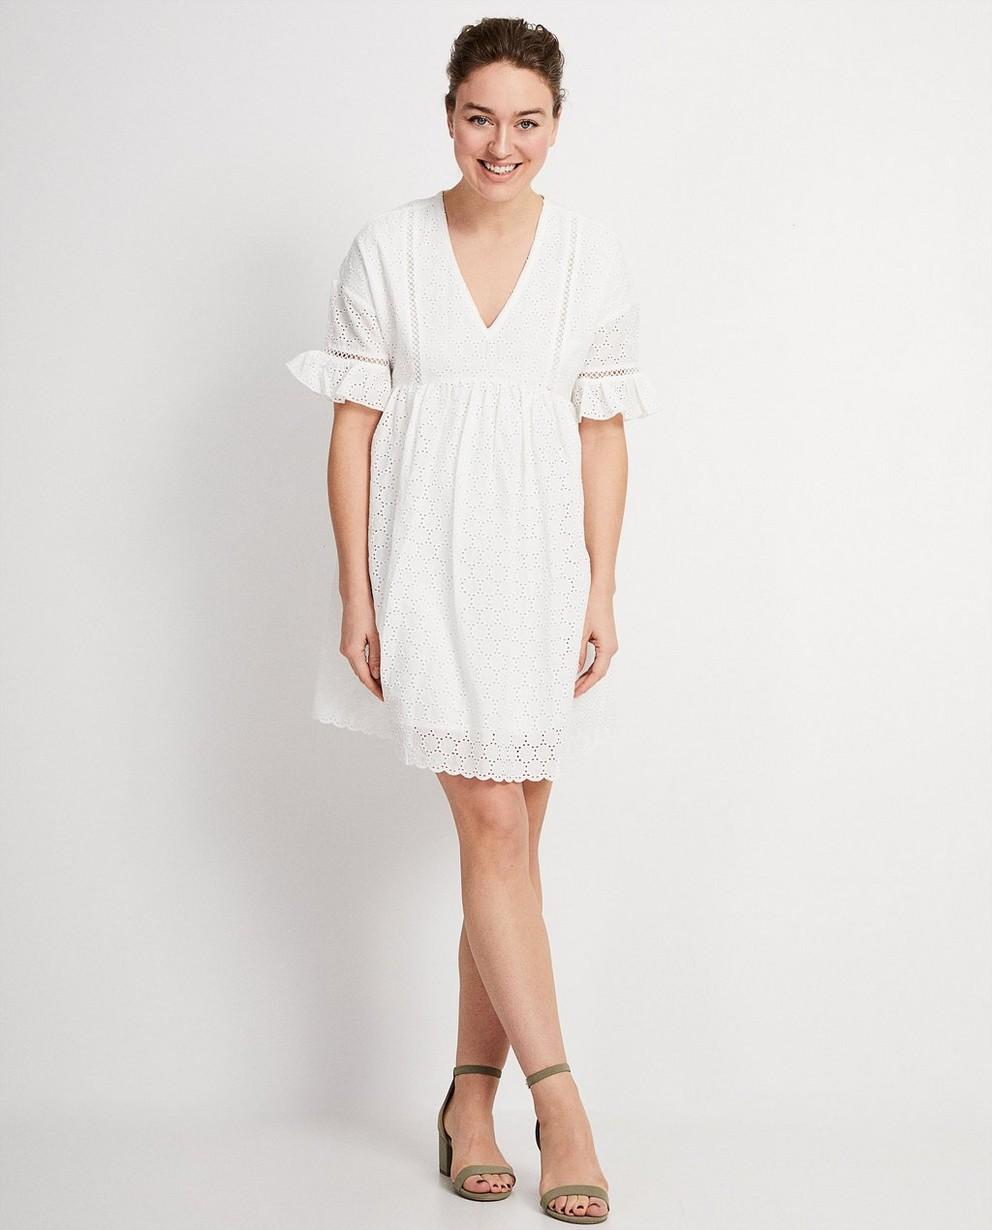 Wit kleedje Katja Retsin - met ruches aan mouw - Katja Retsin